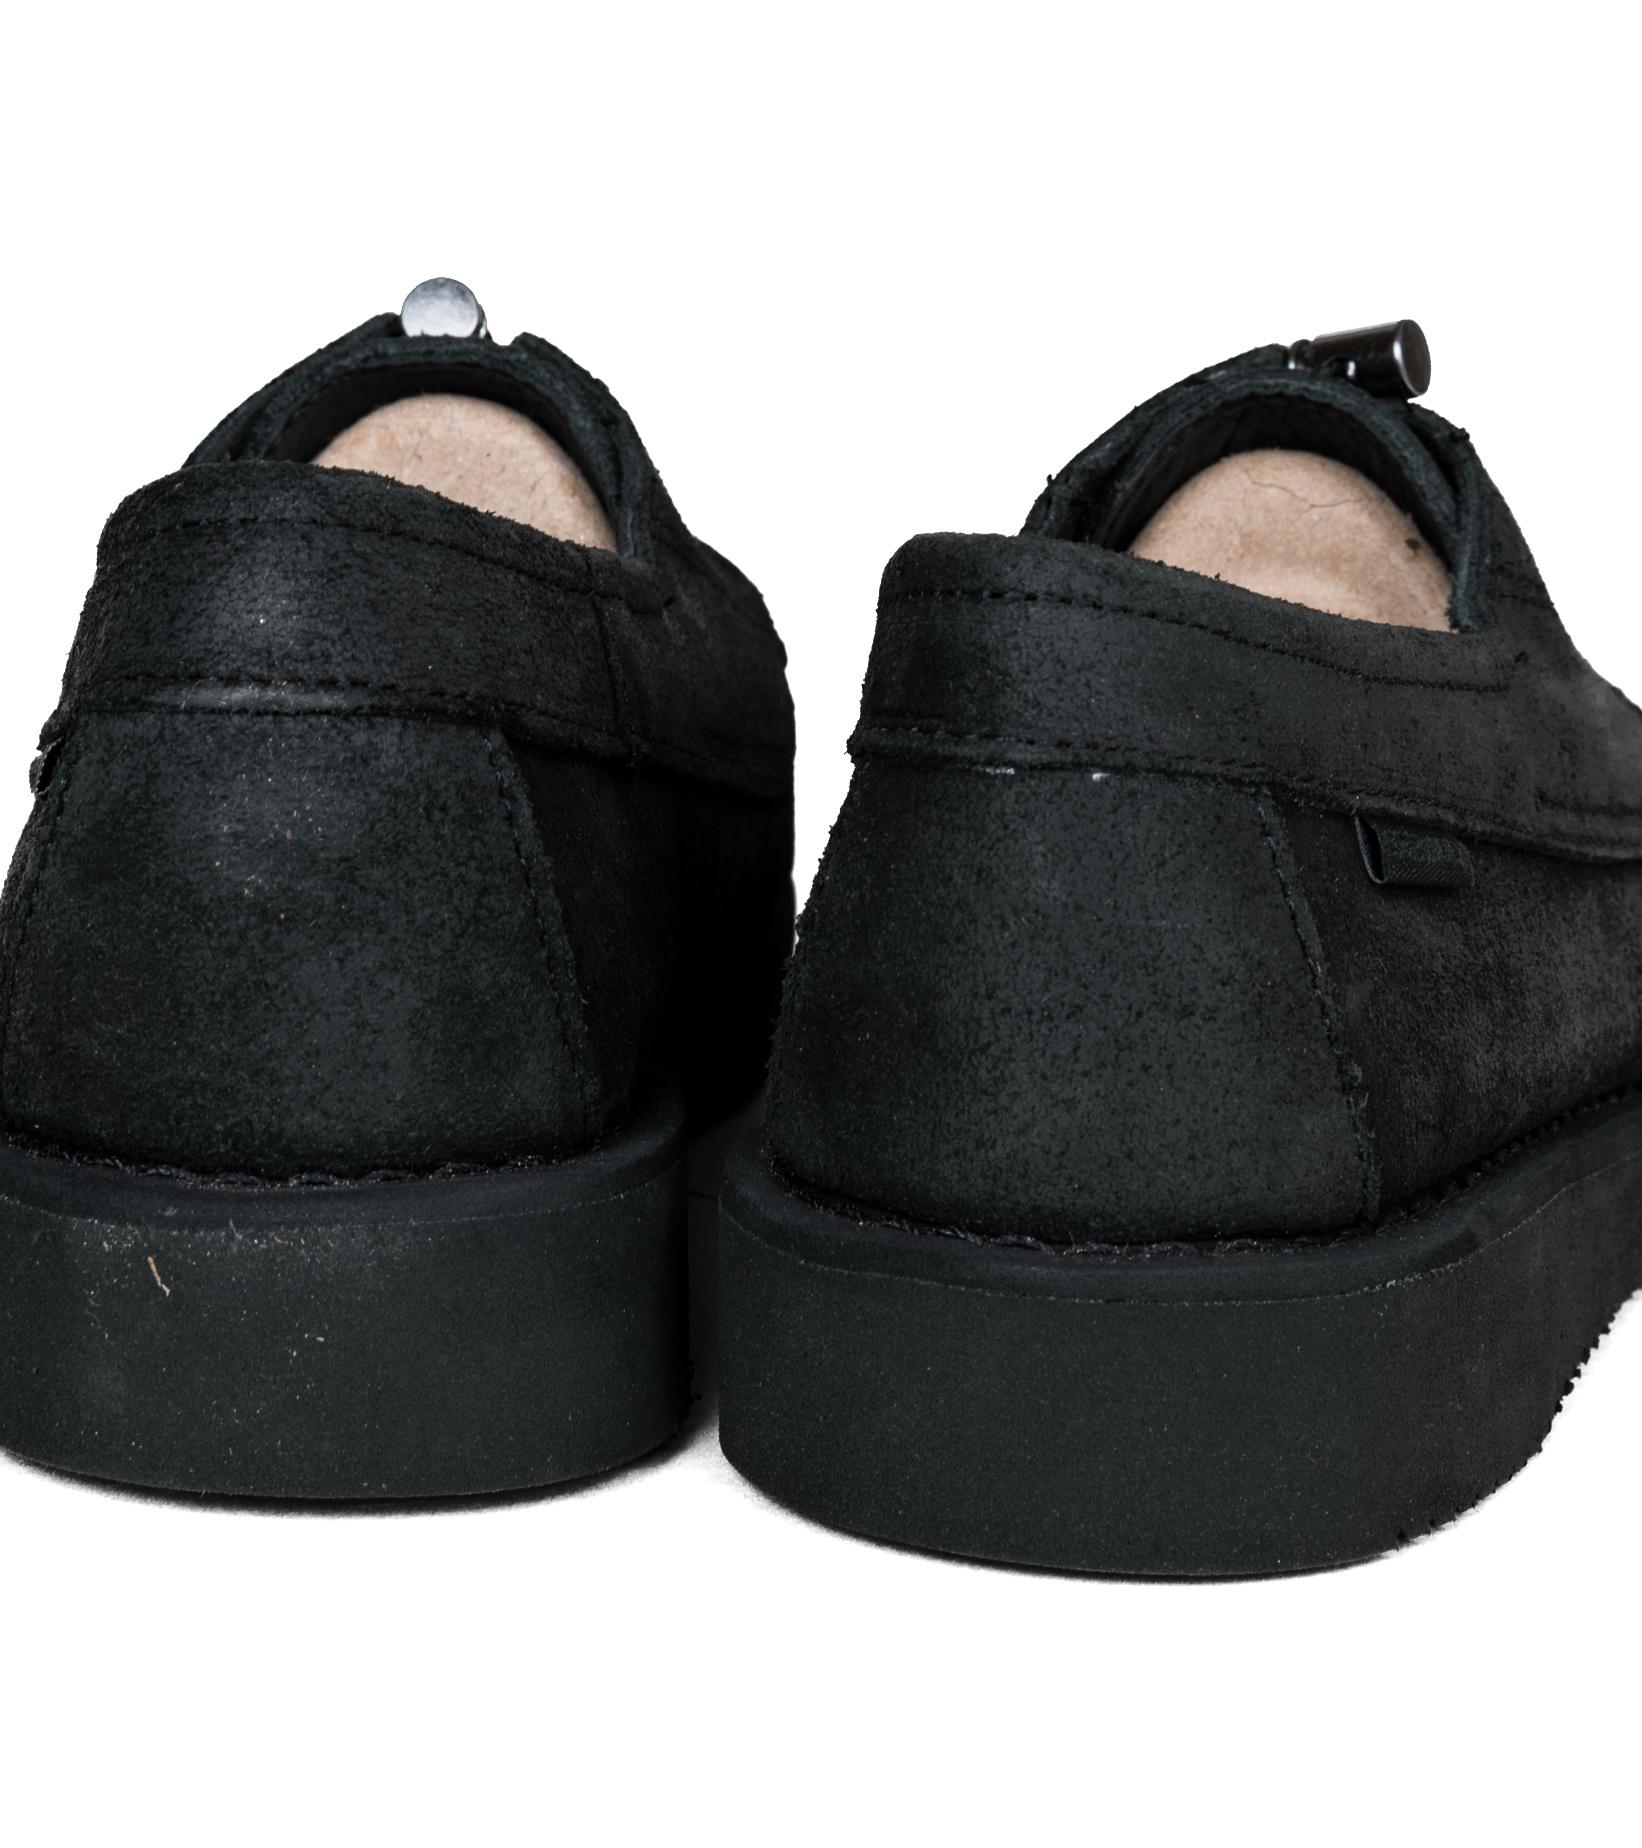 "Coverdeck x Engineered Garments ""Black ""-6"